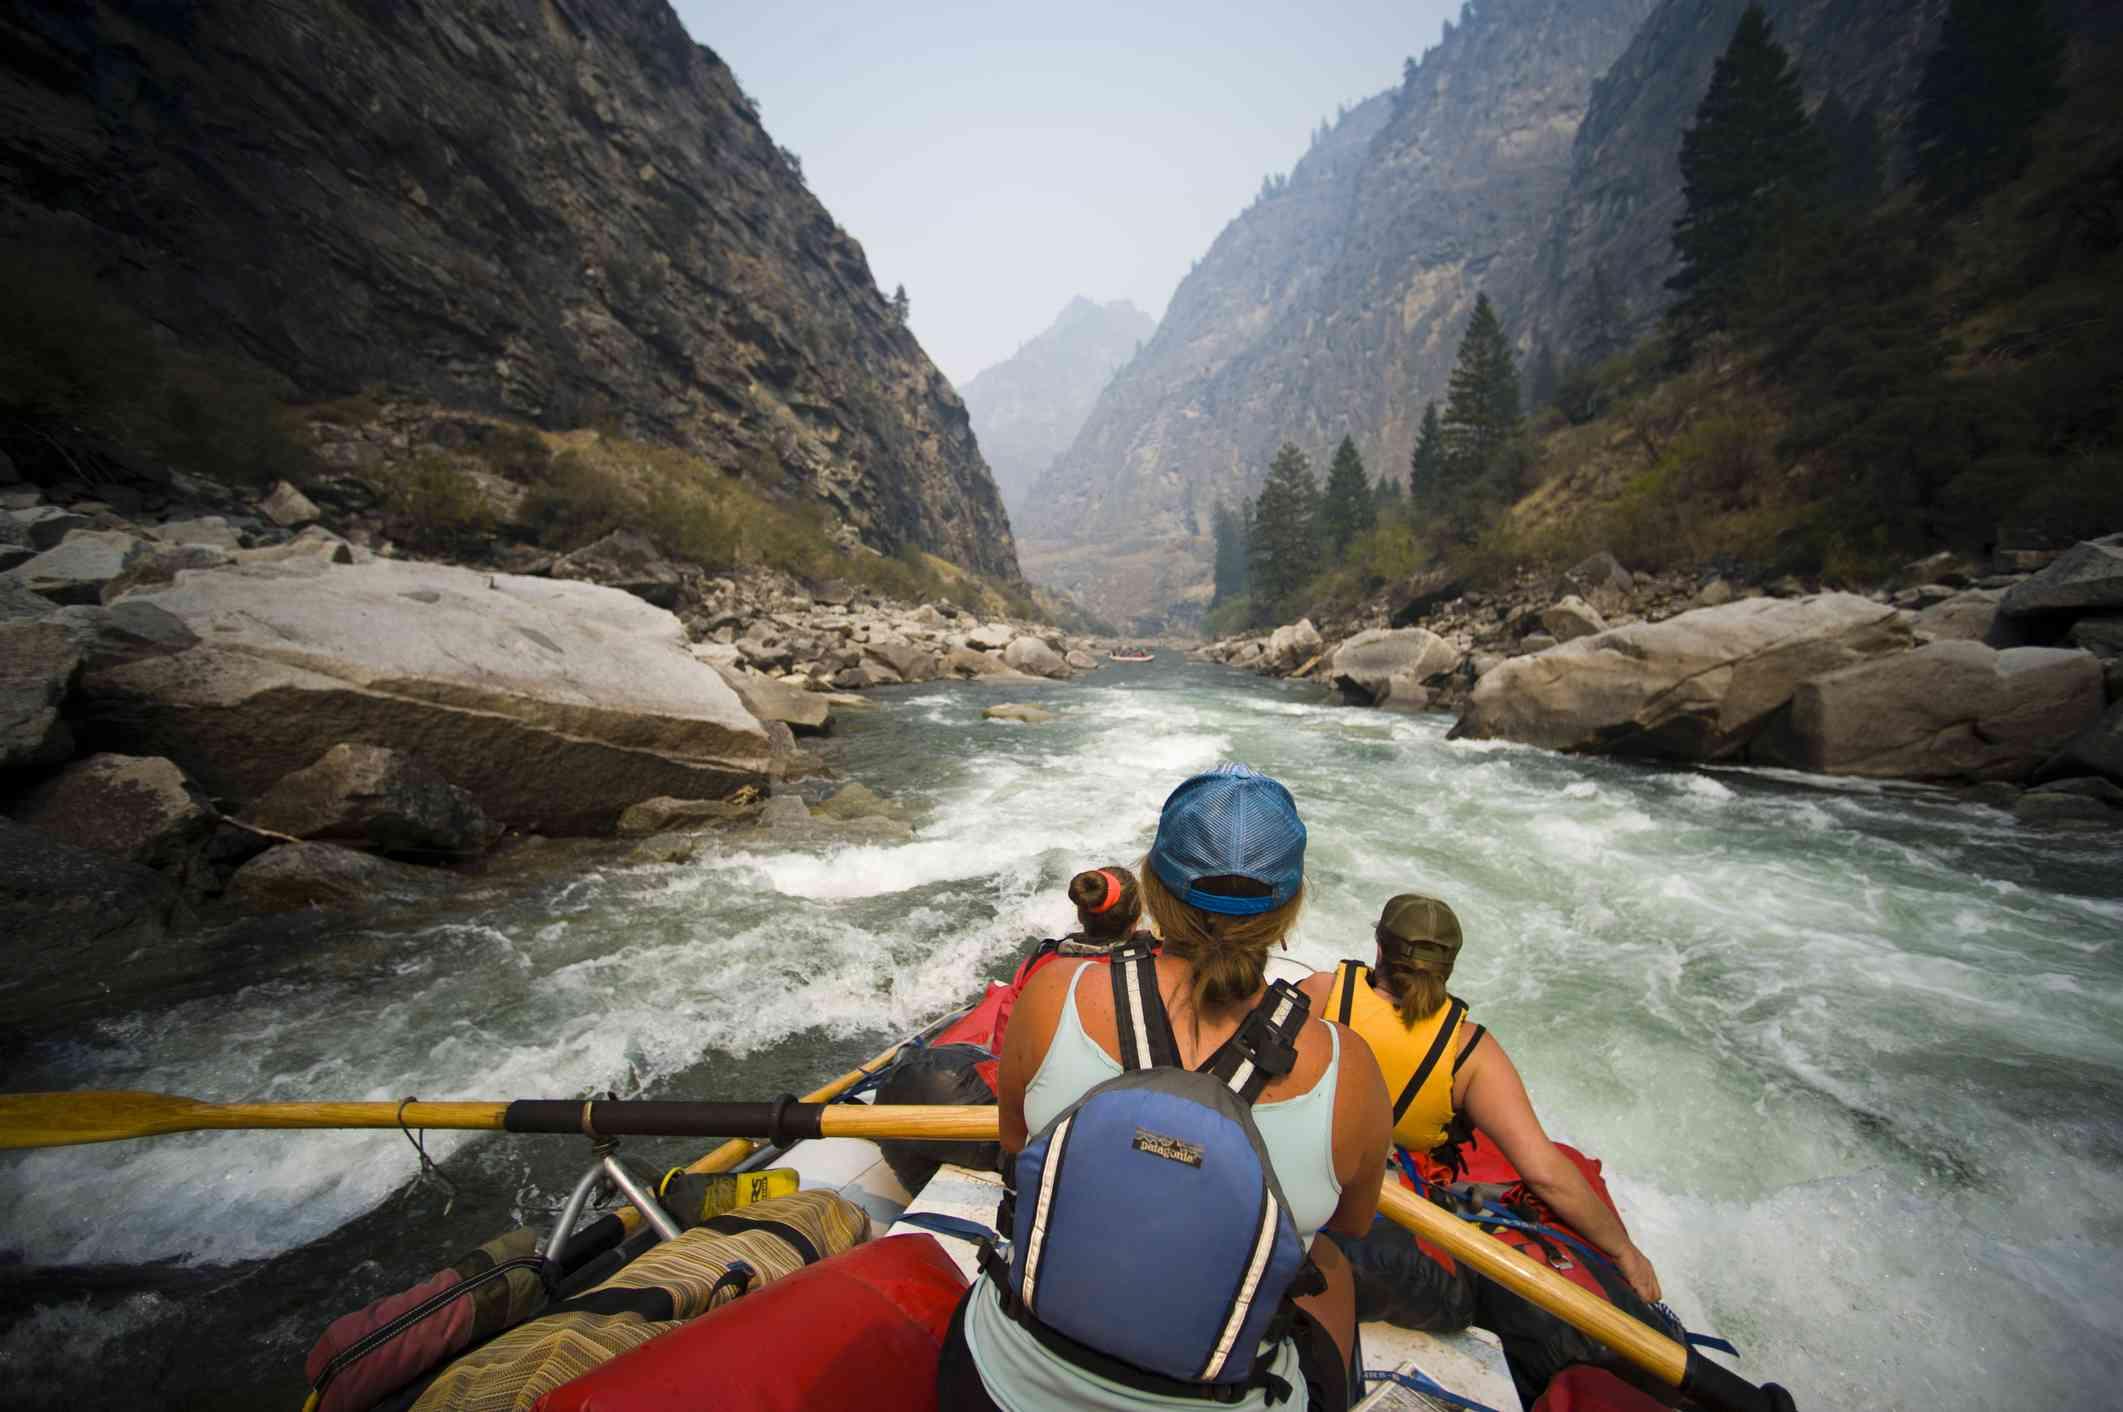 Whitewater rafting on Idaho's Salmon River.